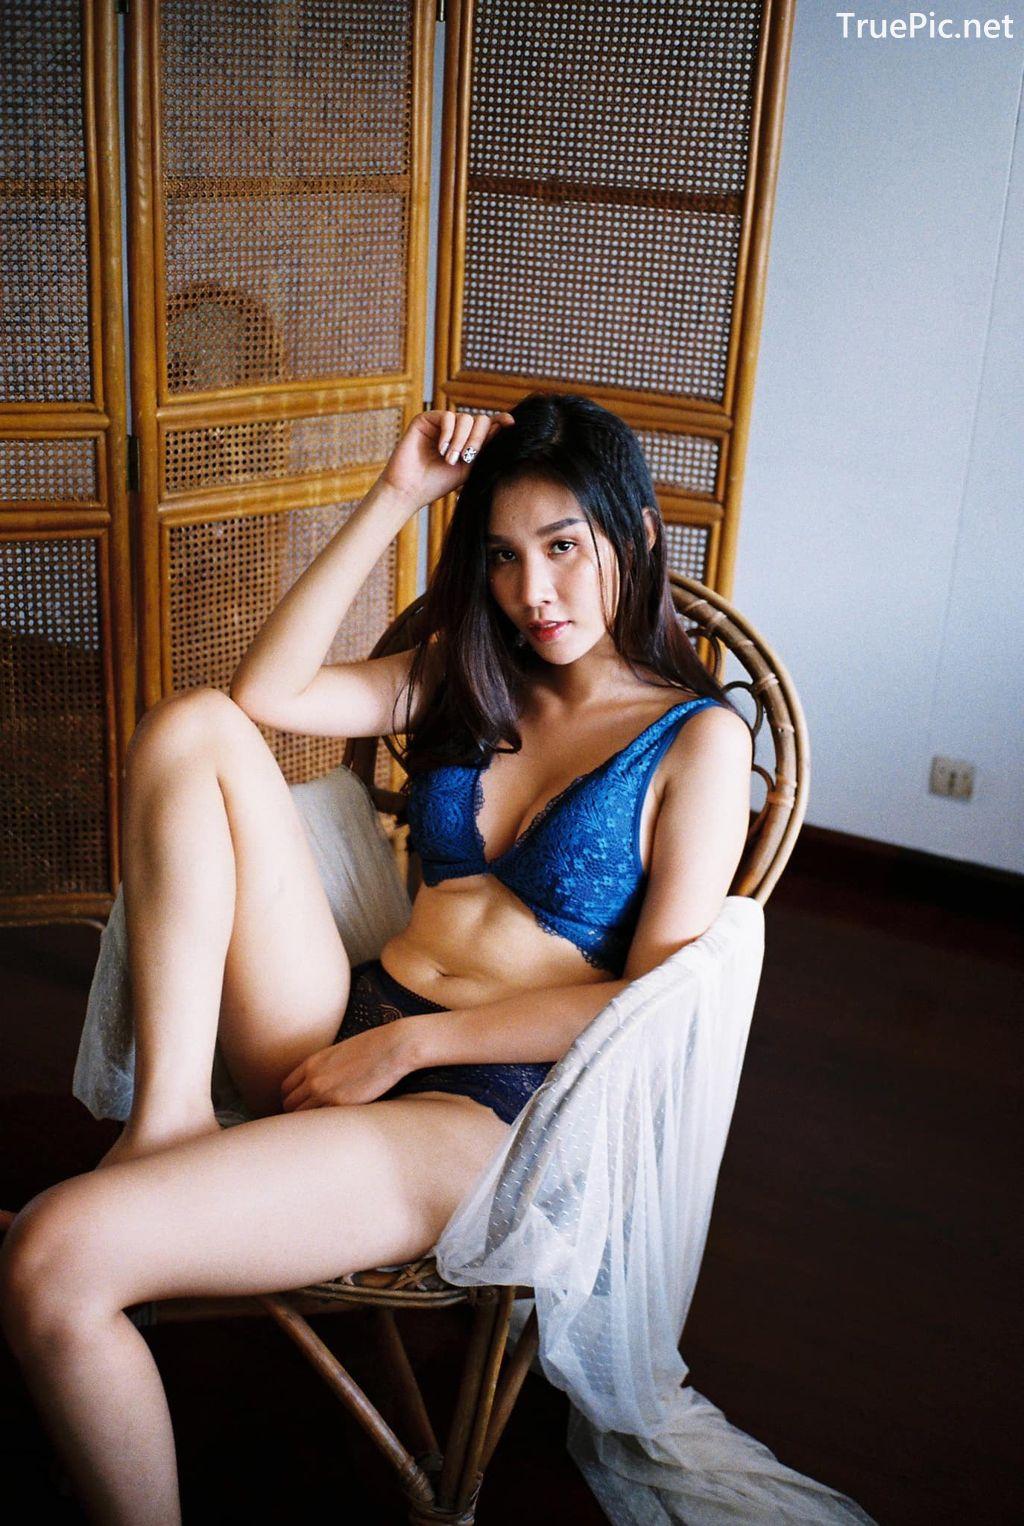 Image-Thailand-Model-Ssomch-Tanass-Blue-Lingerie-TruePic.net-TruePic.net- Picture-23